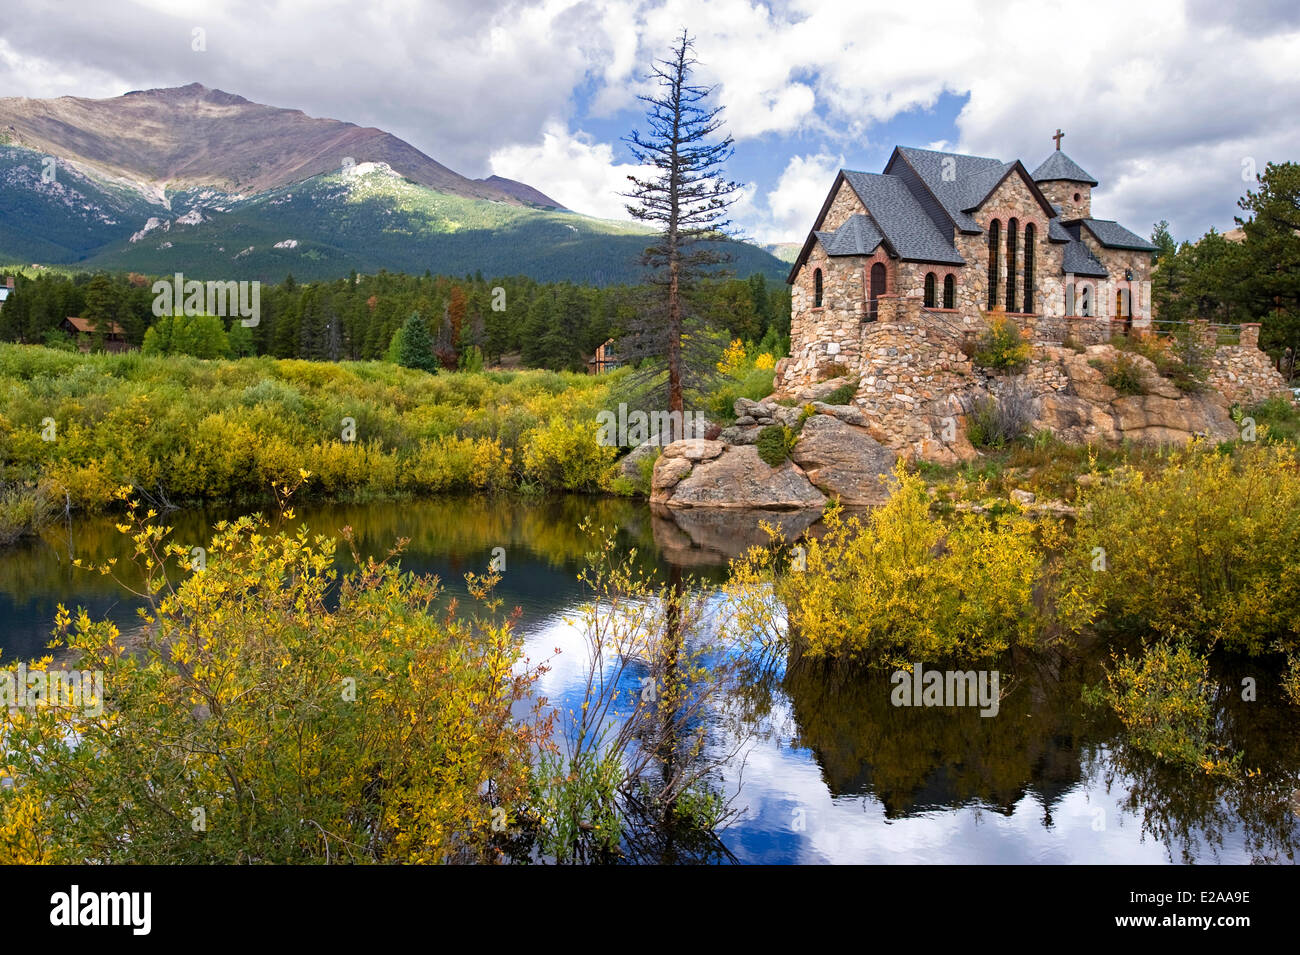 United States Colorado Rocky Mountain National Park St Malo